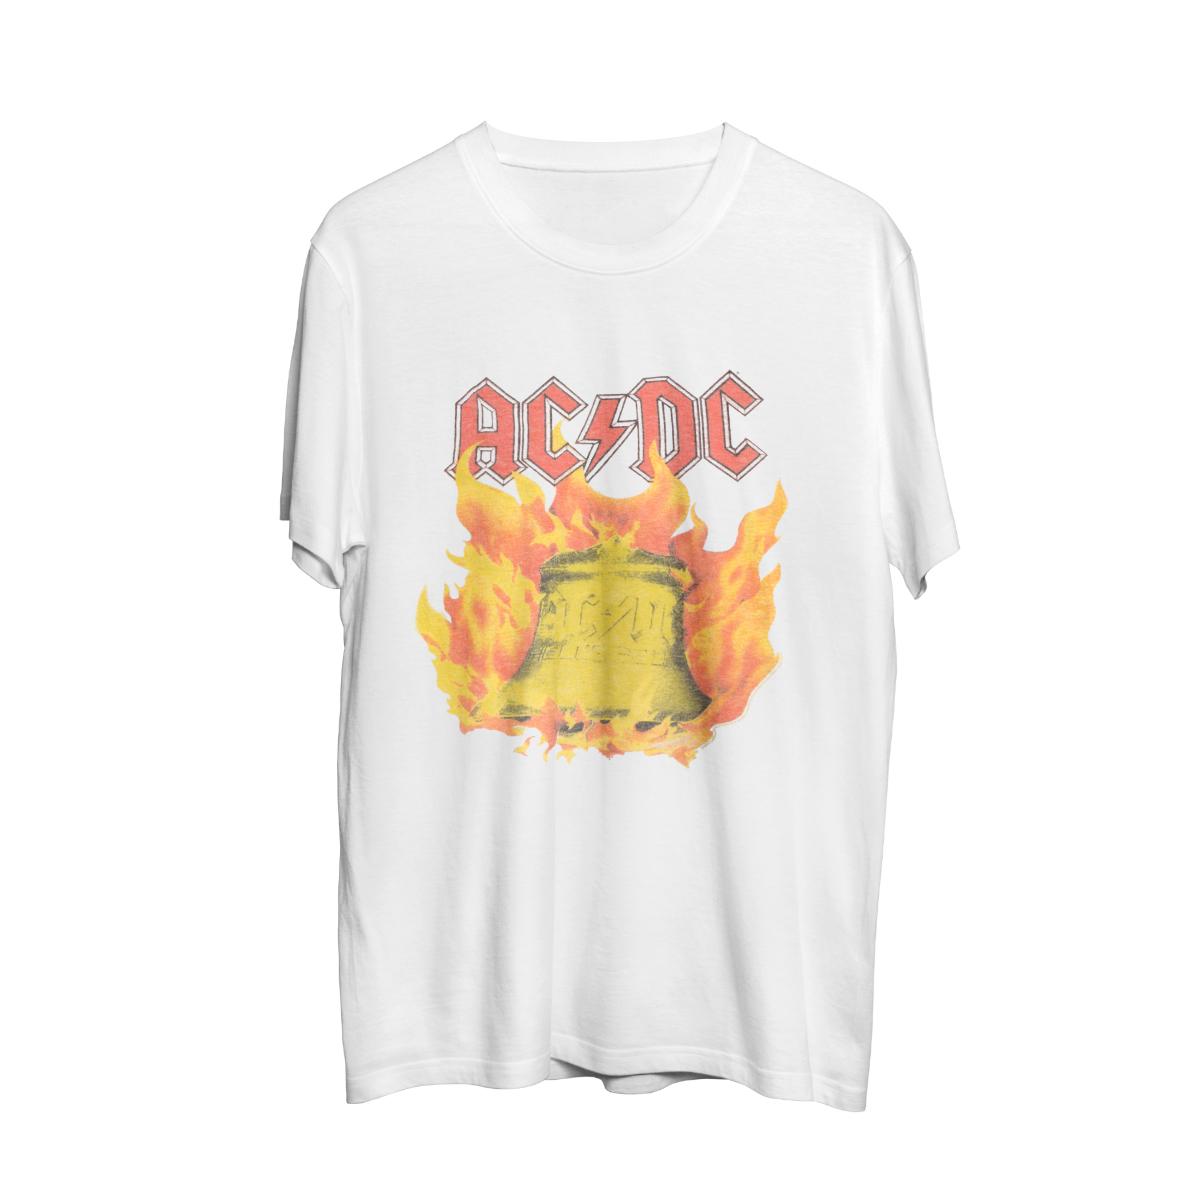 AC/DC White Hells Bells T-Shirt